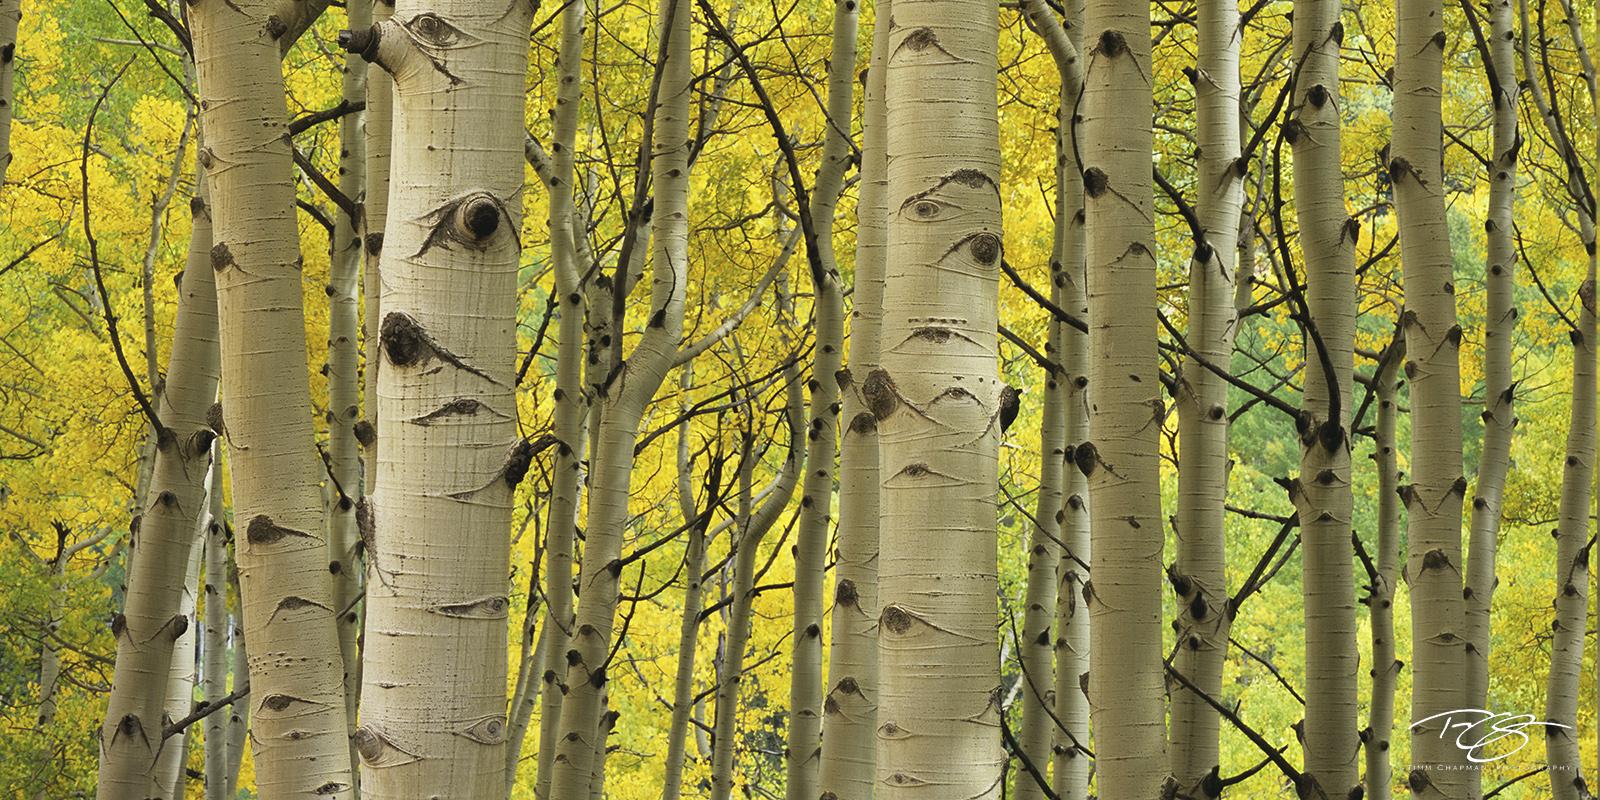 Colorado, aspen, autumn, fallen leaves, yellow leaves, golden canopy, aumtumn peak, leaves at their peak, photo